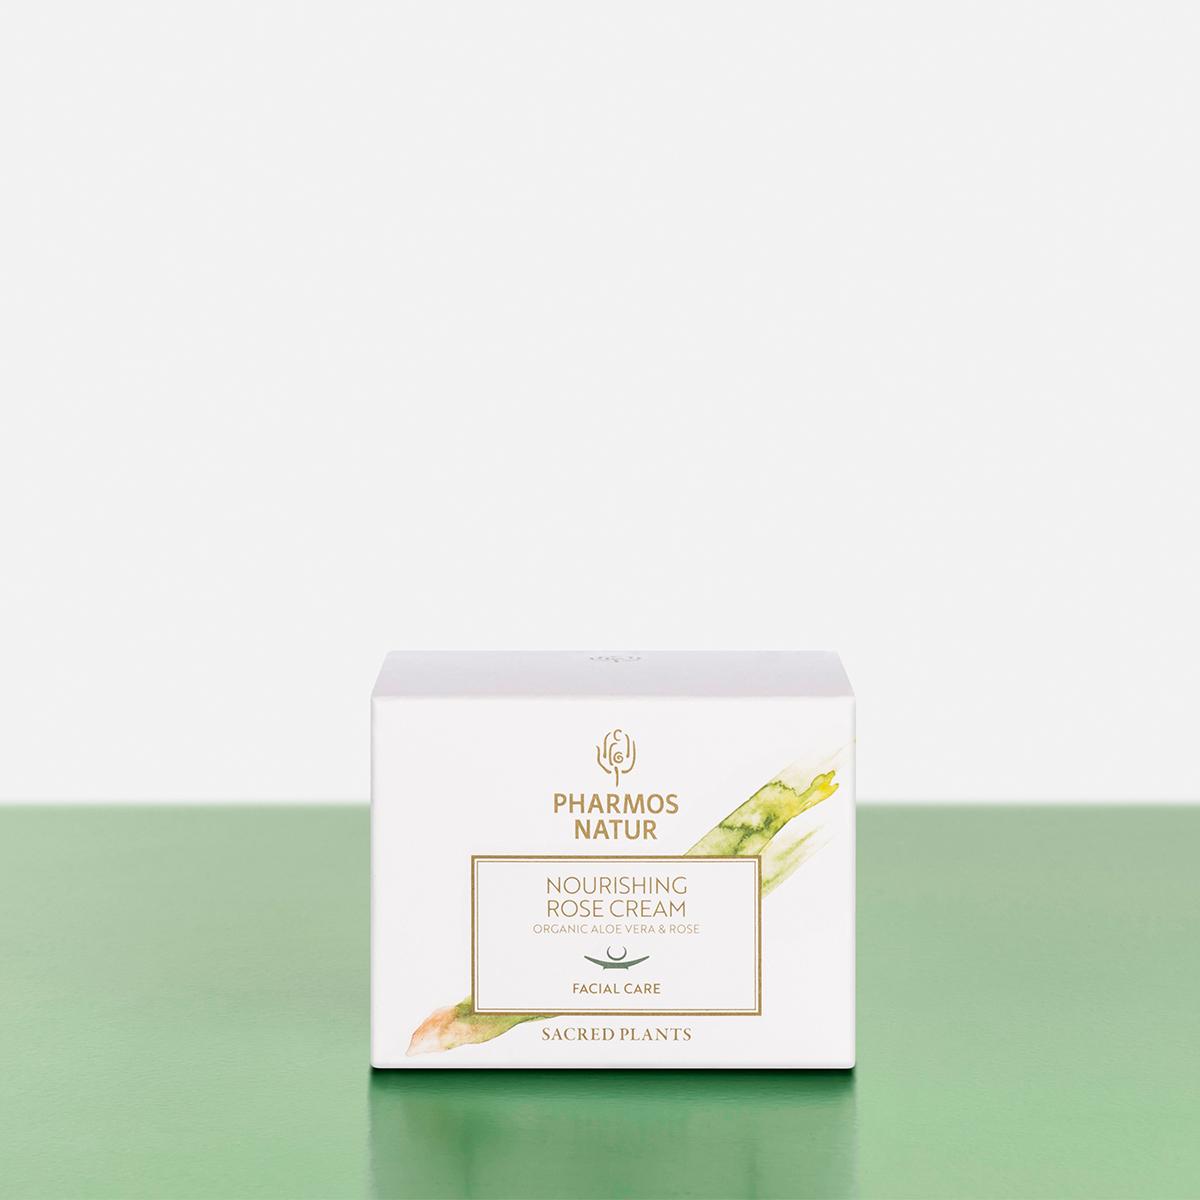 Verpackung nourishing rose cream Produktbild